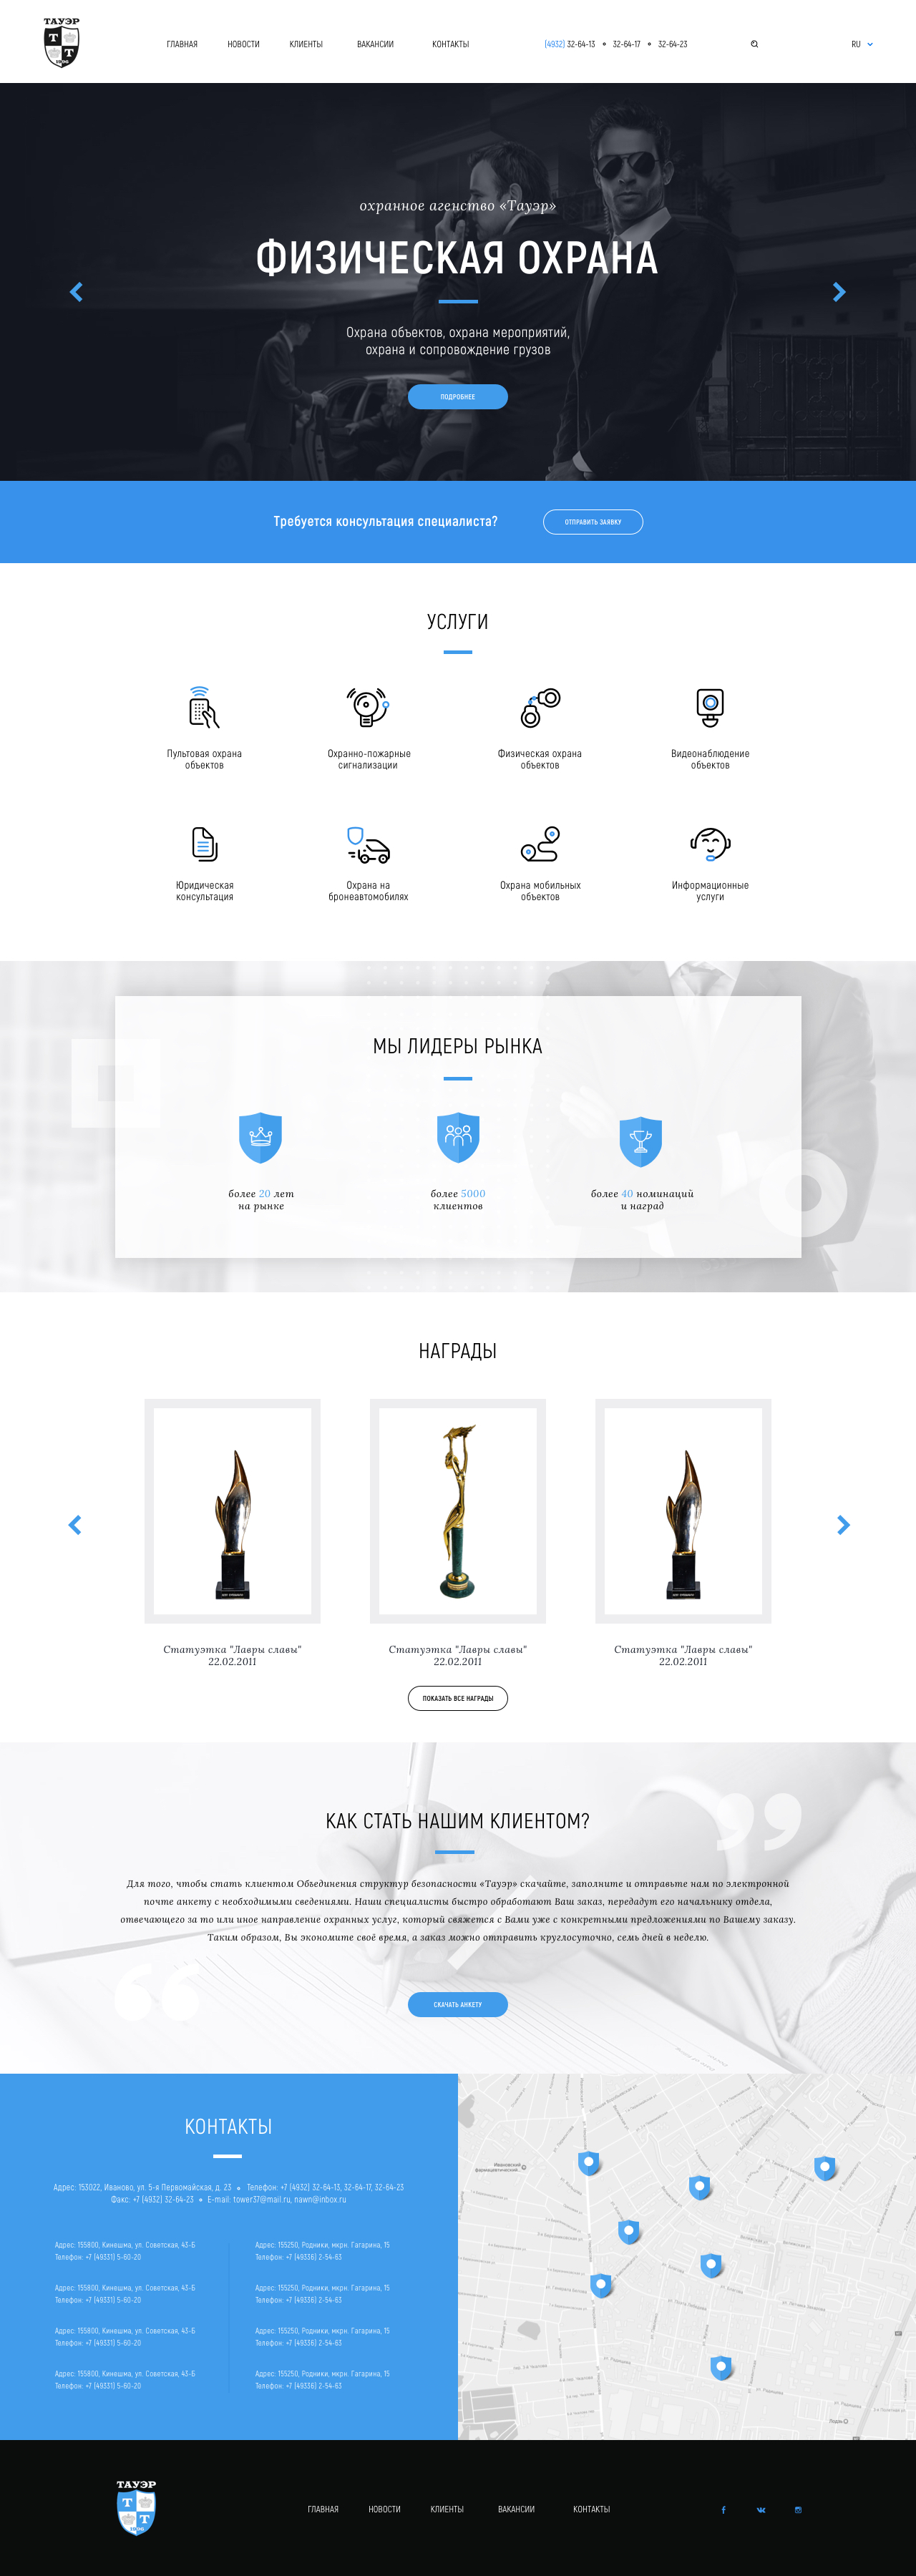 Редизайн существующего сайта компании (ЗАВЕРШЁН) фото f_69858fa58c26b51b.jpg